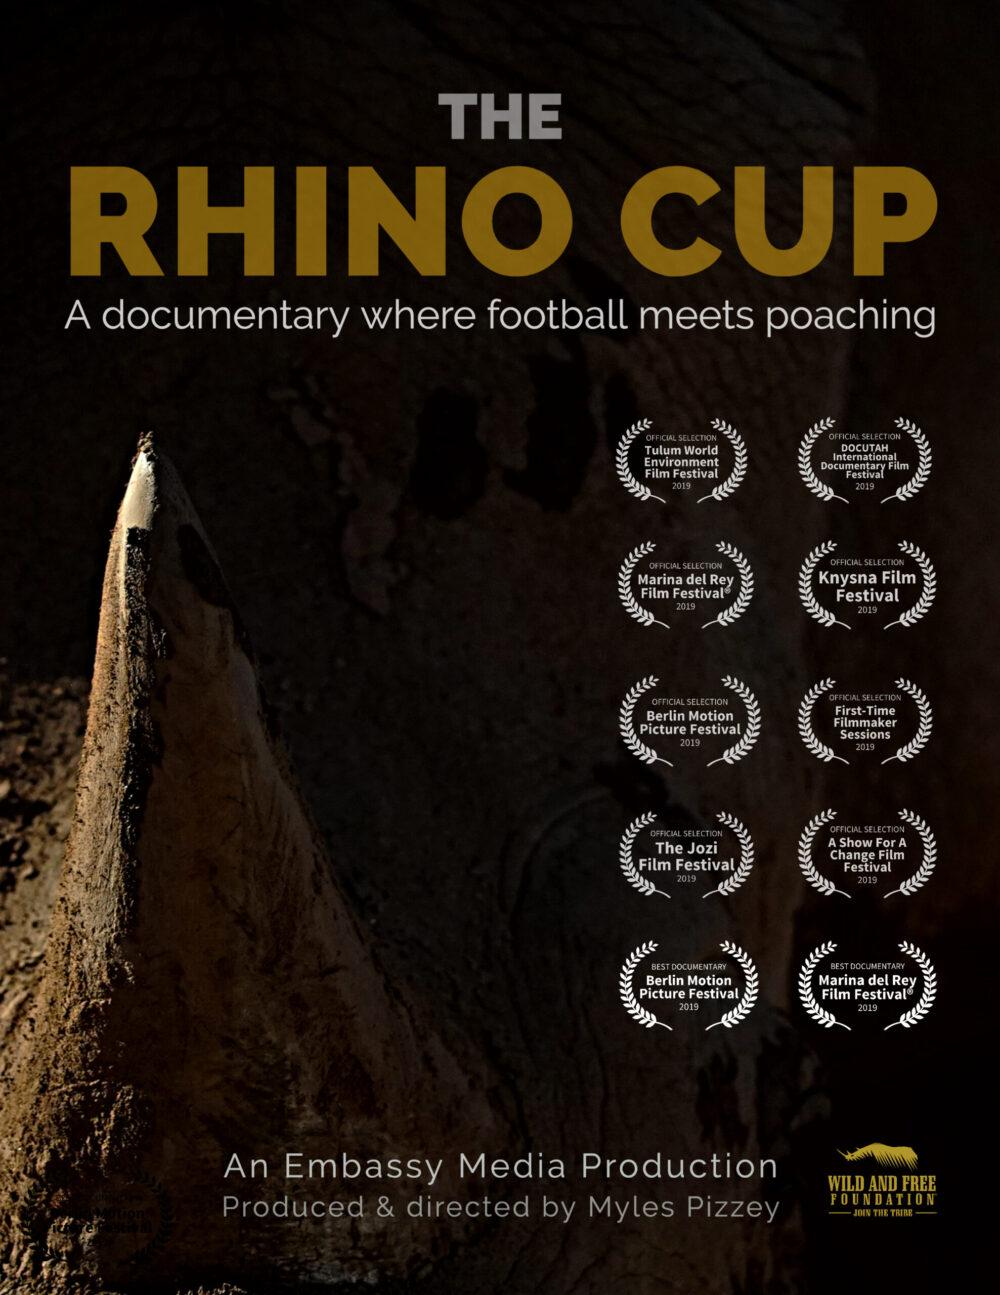 the rhino cup